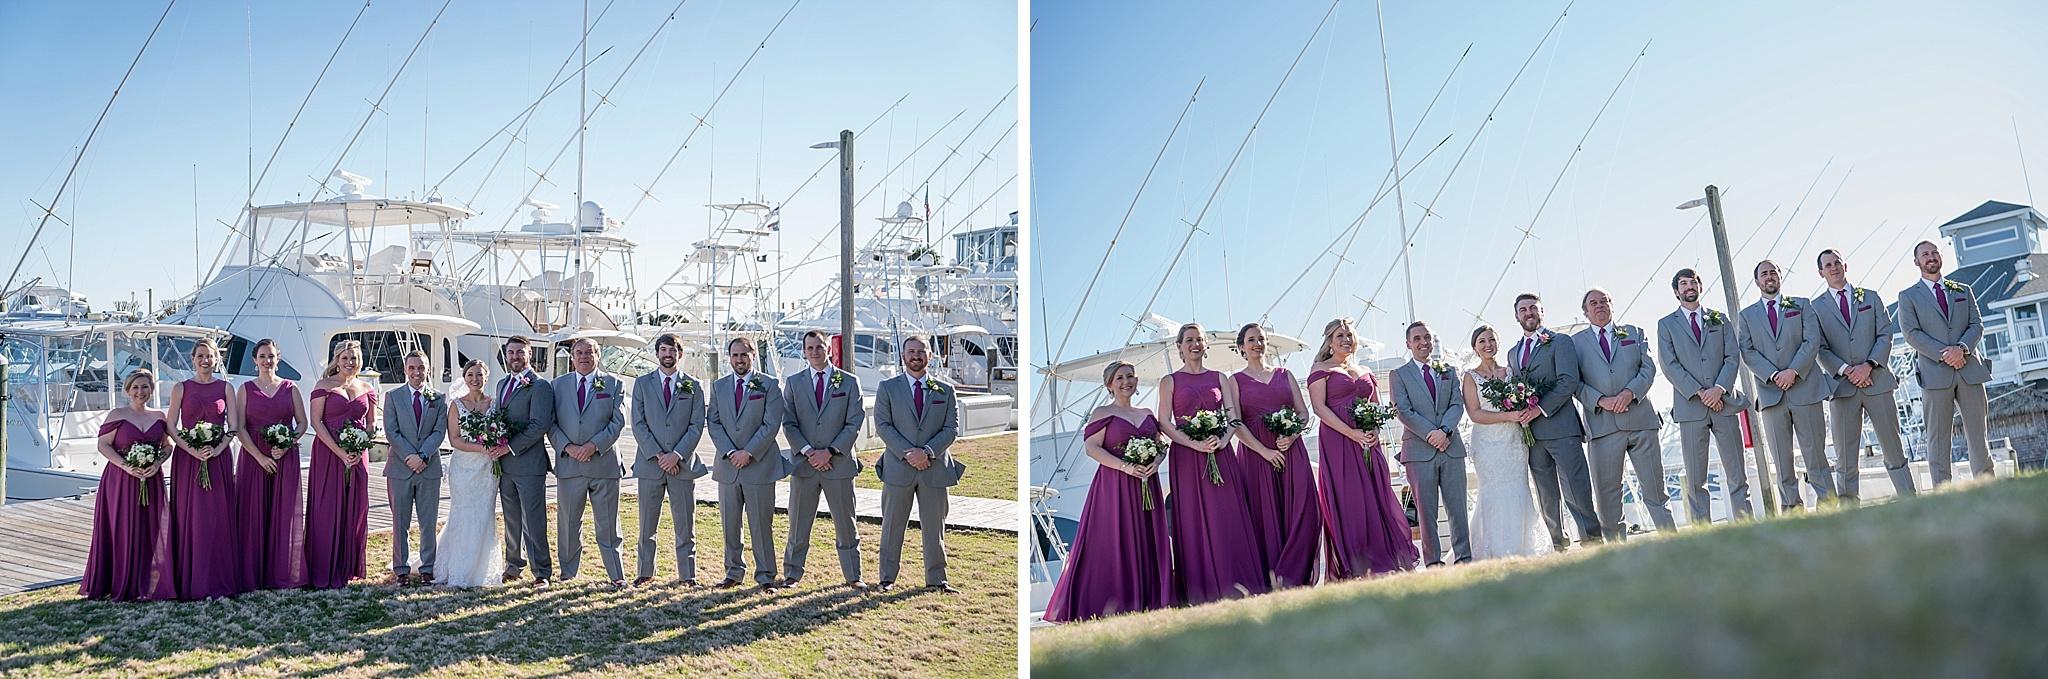 Manteo-NC-Wedding-Photographer-145.jpg